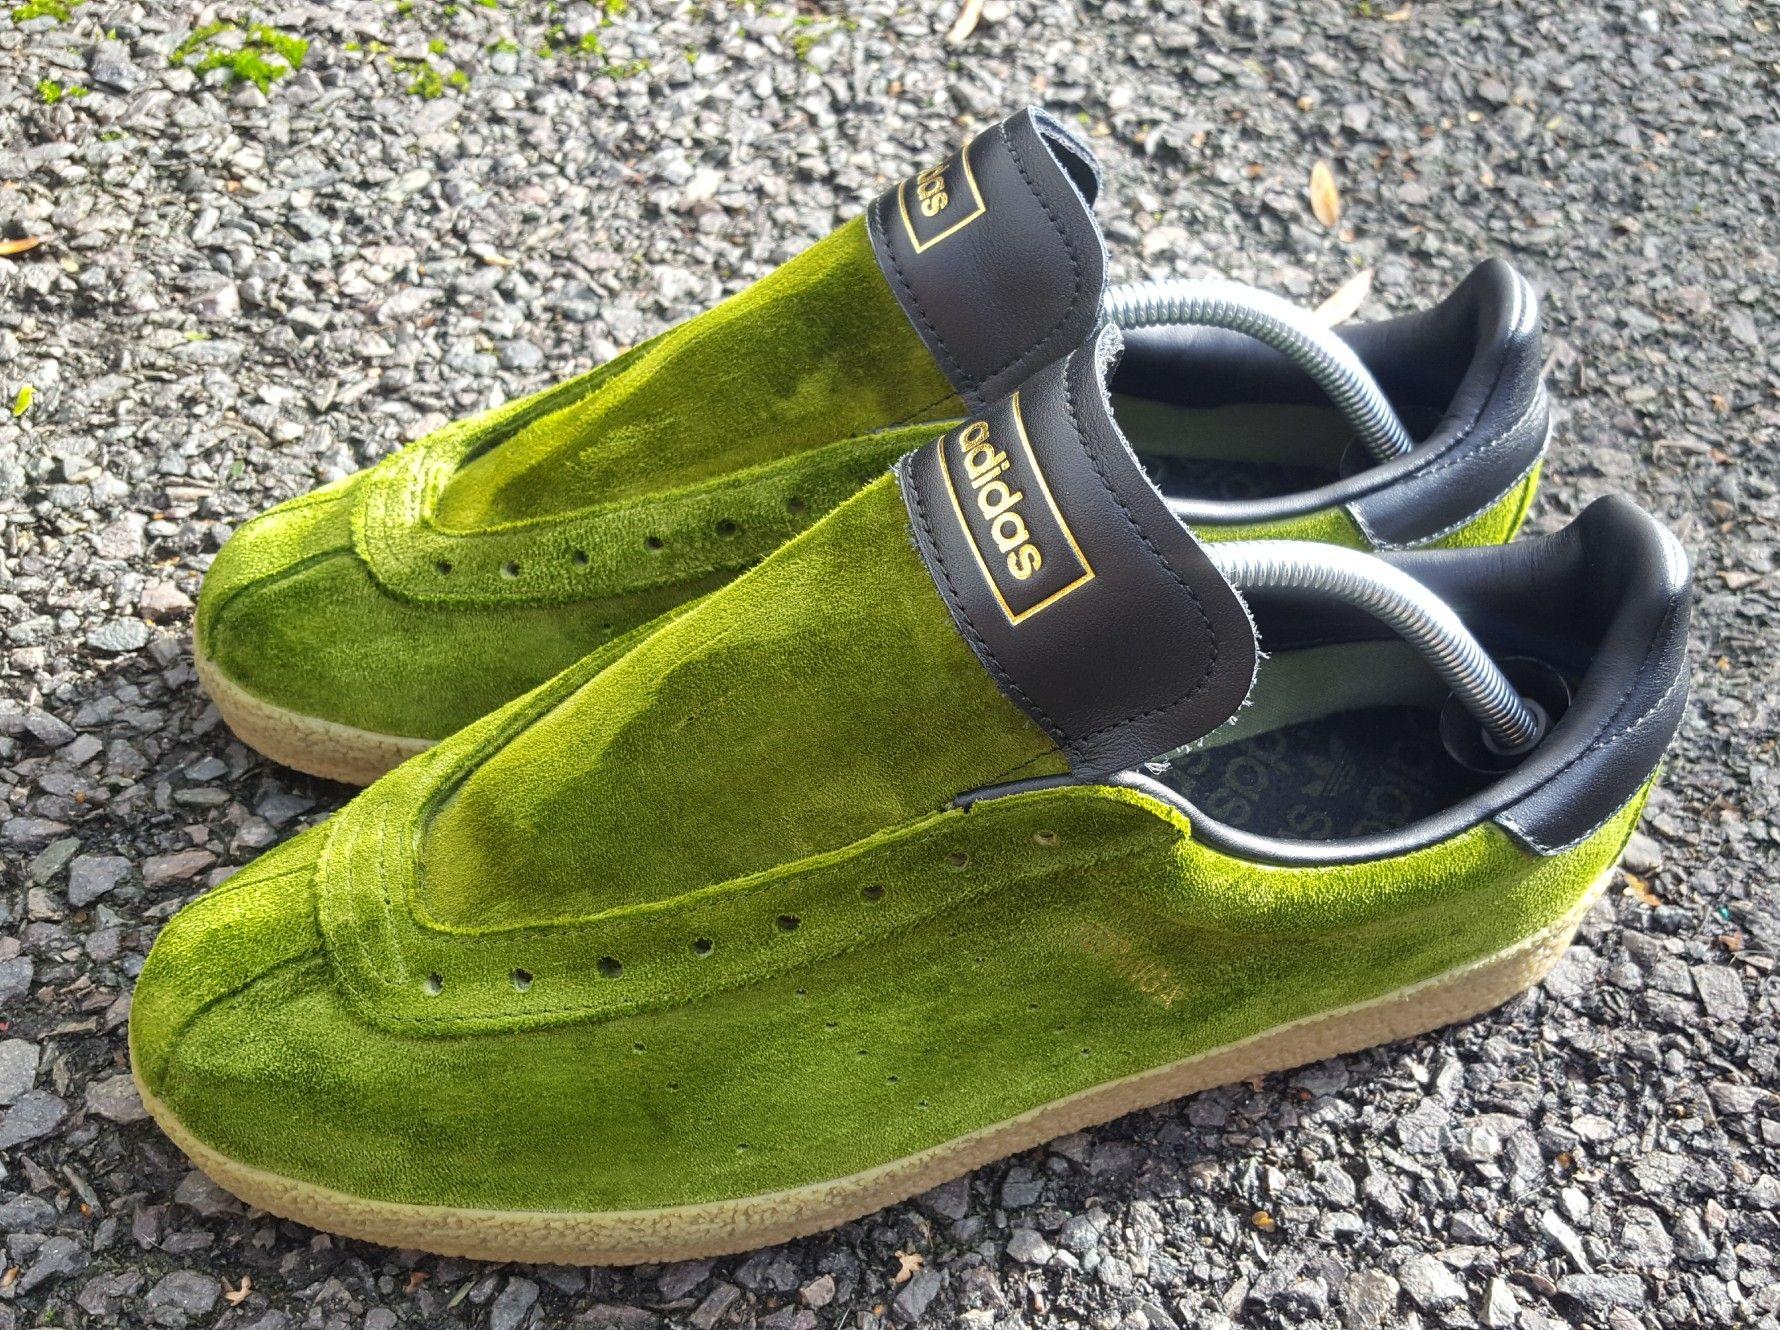 d9a258d62f0 Green Adidas topanga clean re-dye with ardwick green